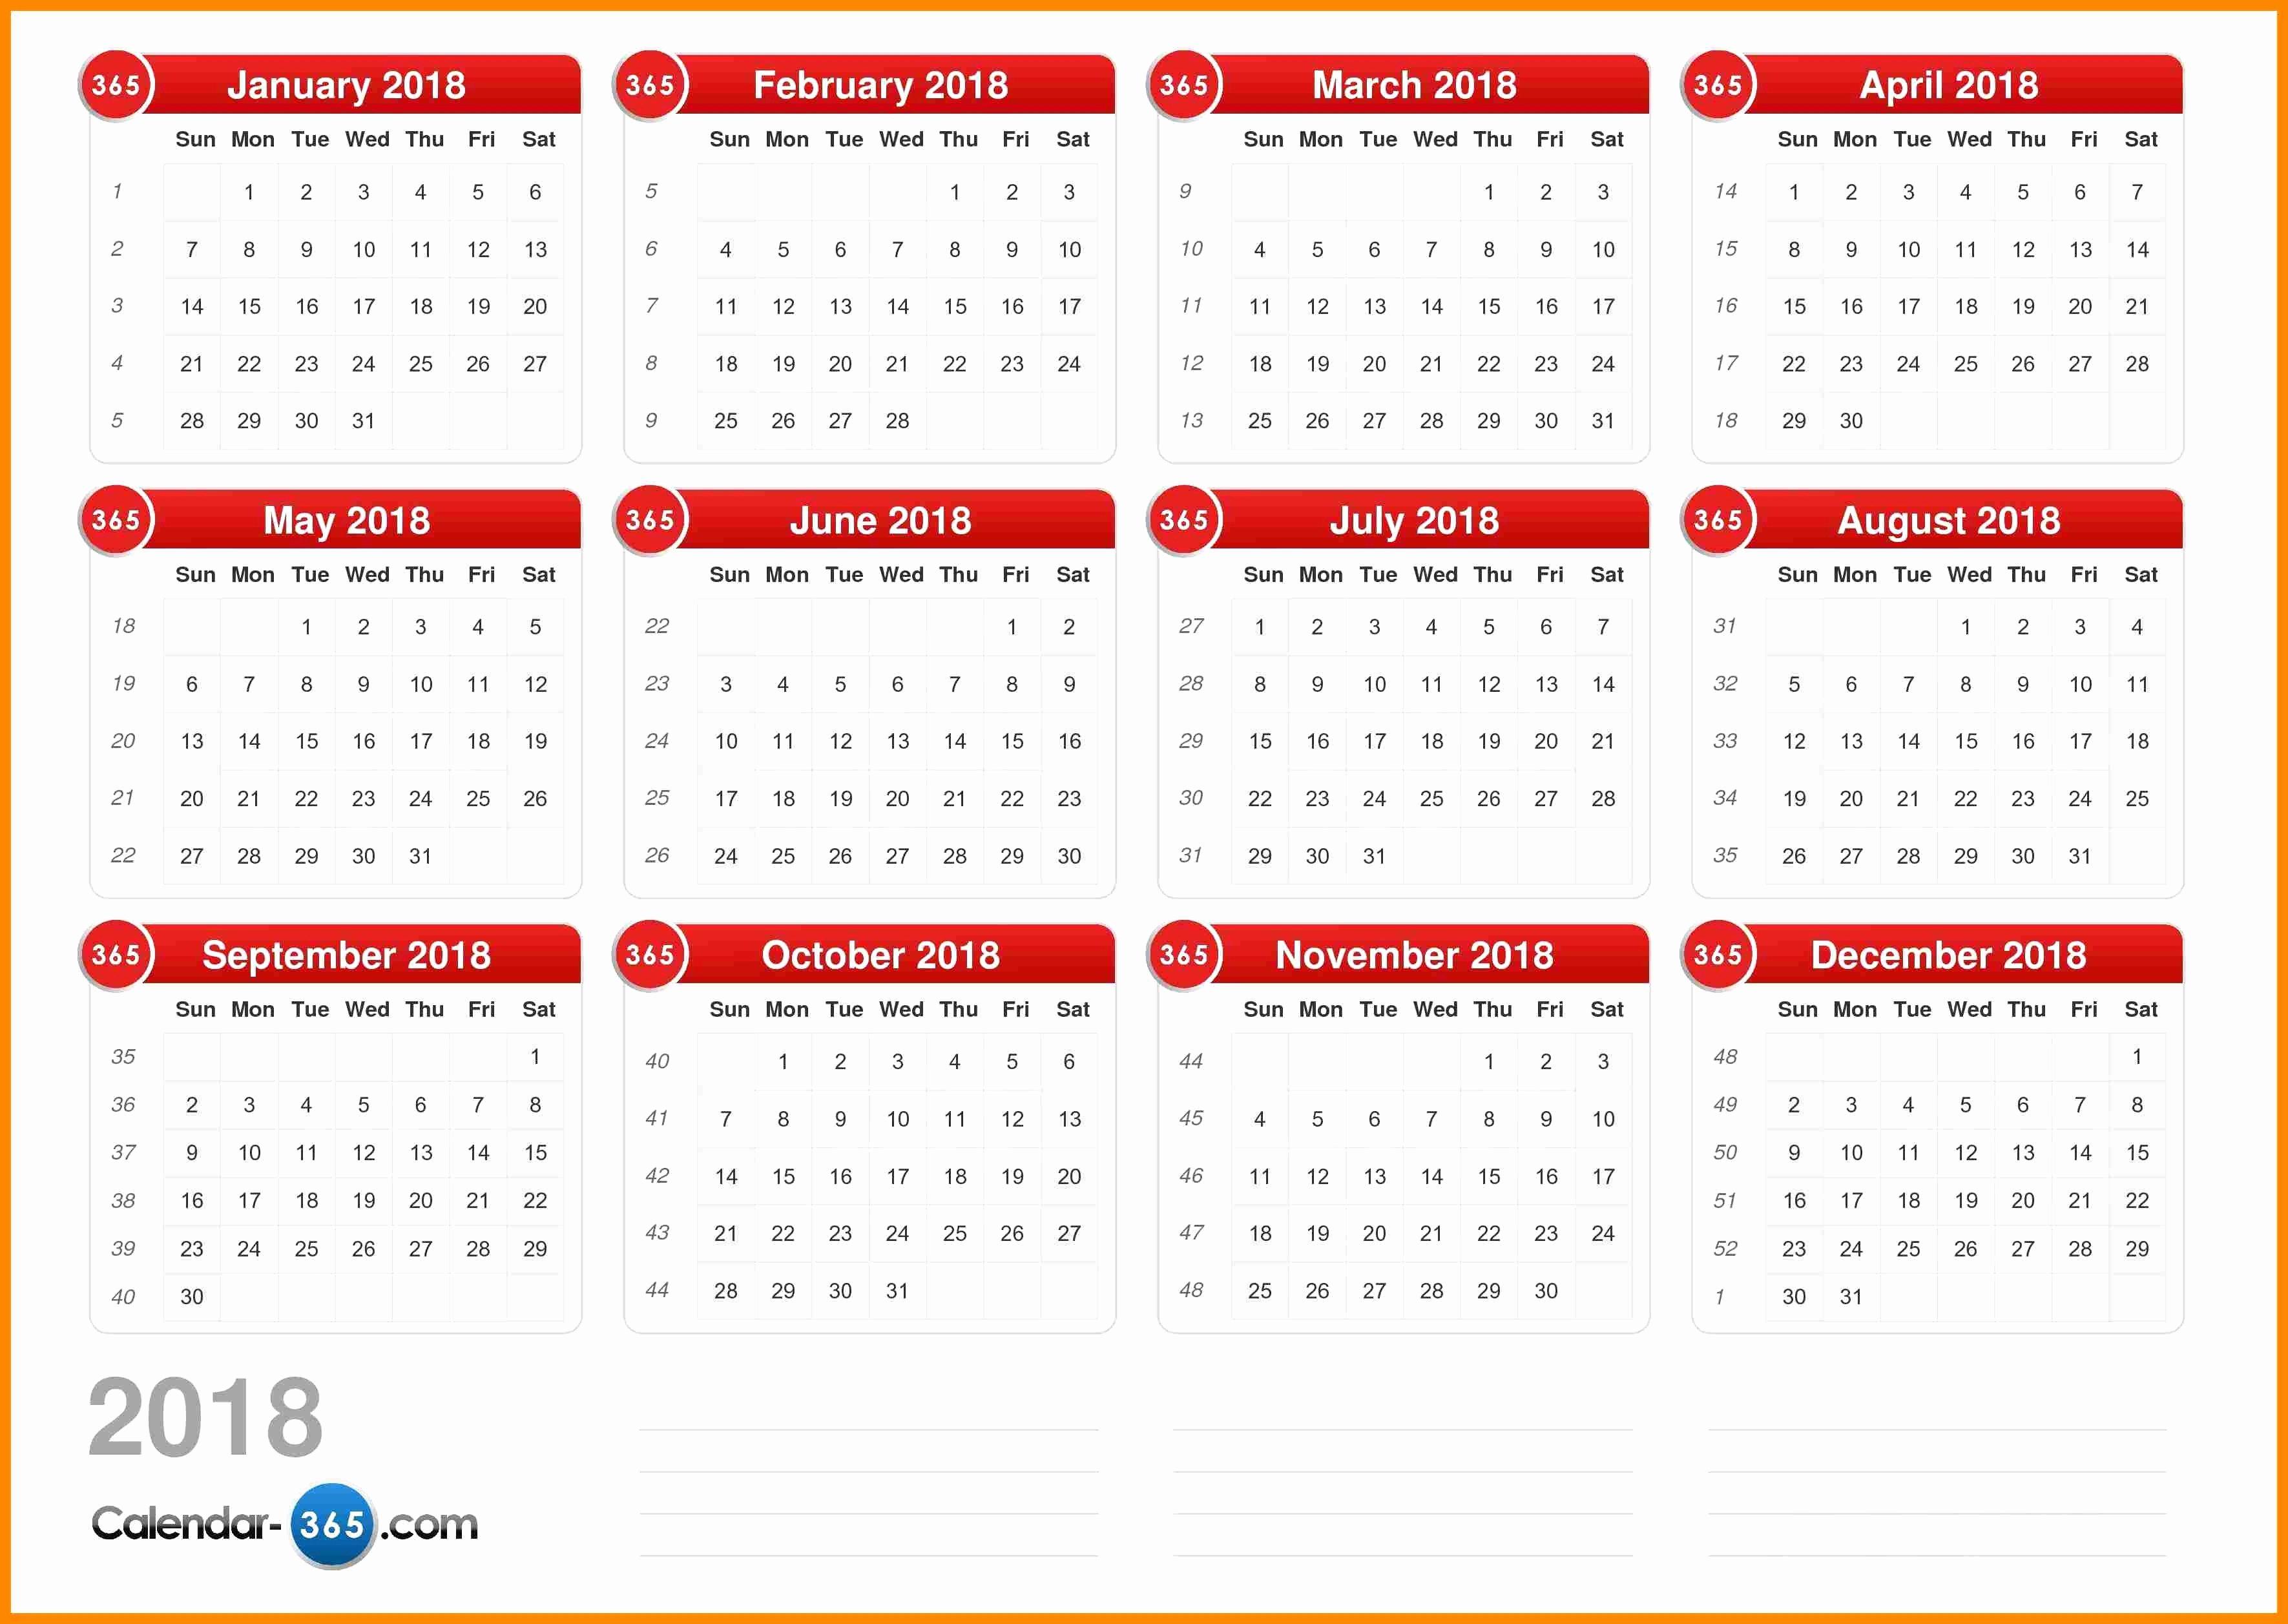 2019 Biweekly Payroll Calendar Template Excel Elegant Adp 2019 Payroll Calendar Semi Monthly